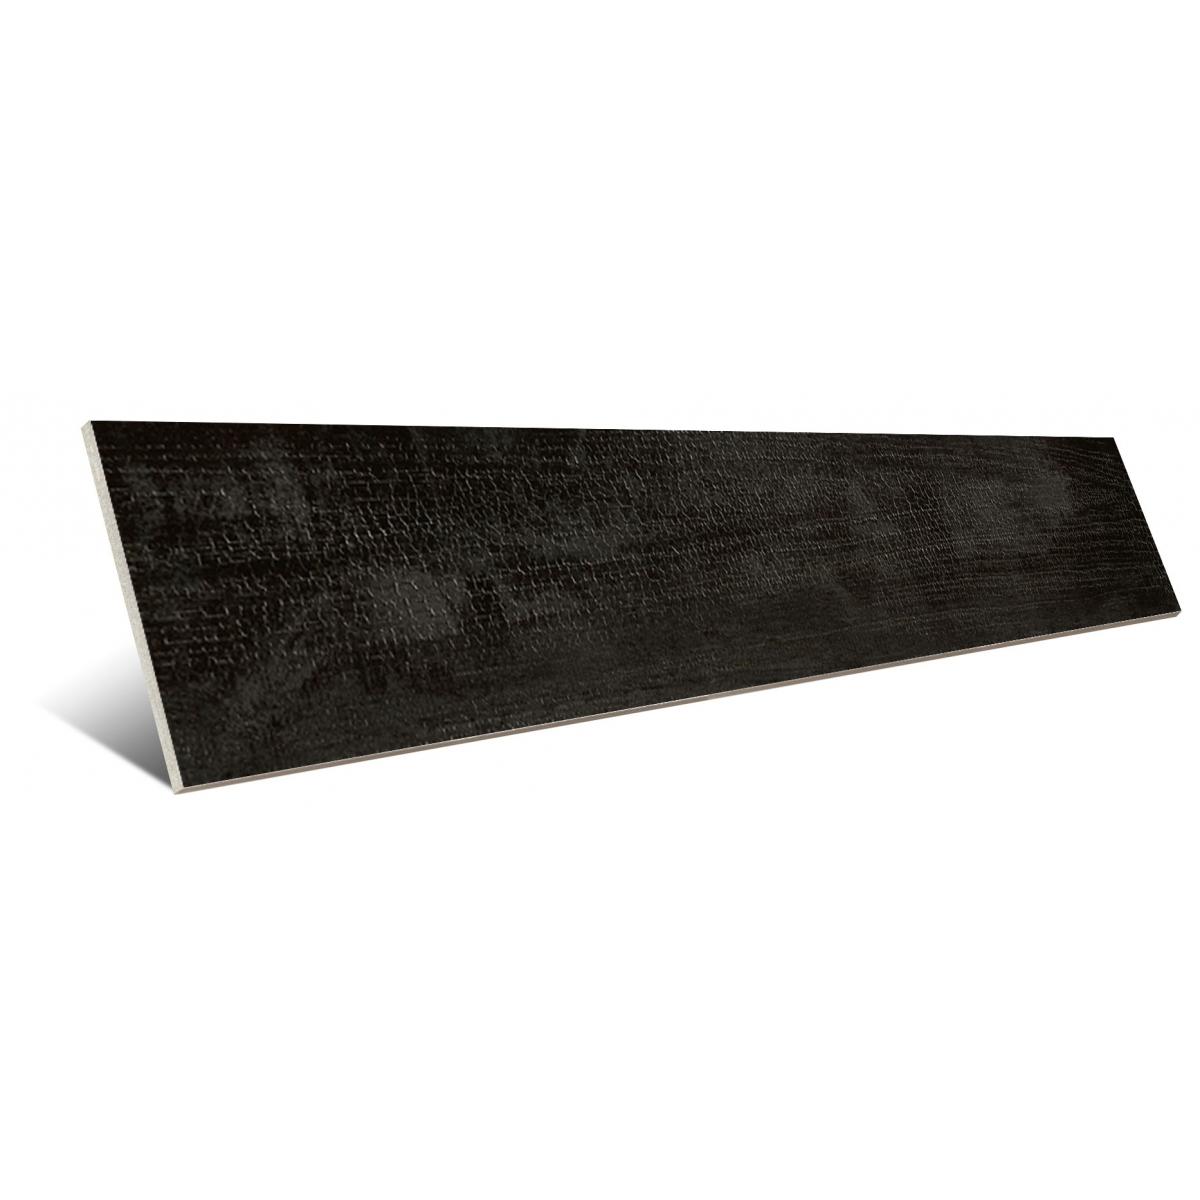 Okinawa Carbon 19,2x119,3 (caja 0,92 m2) Vives